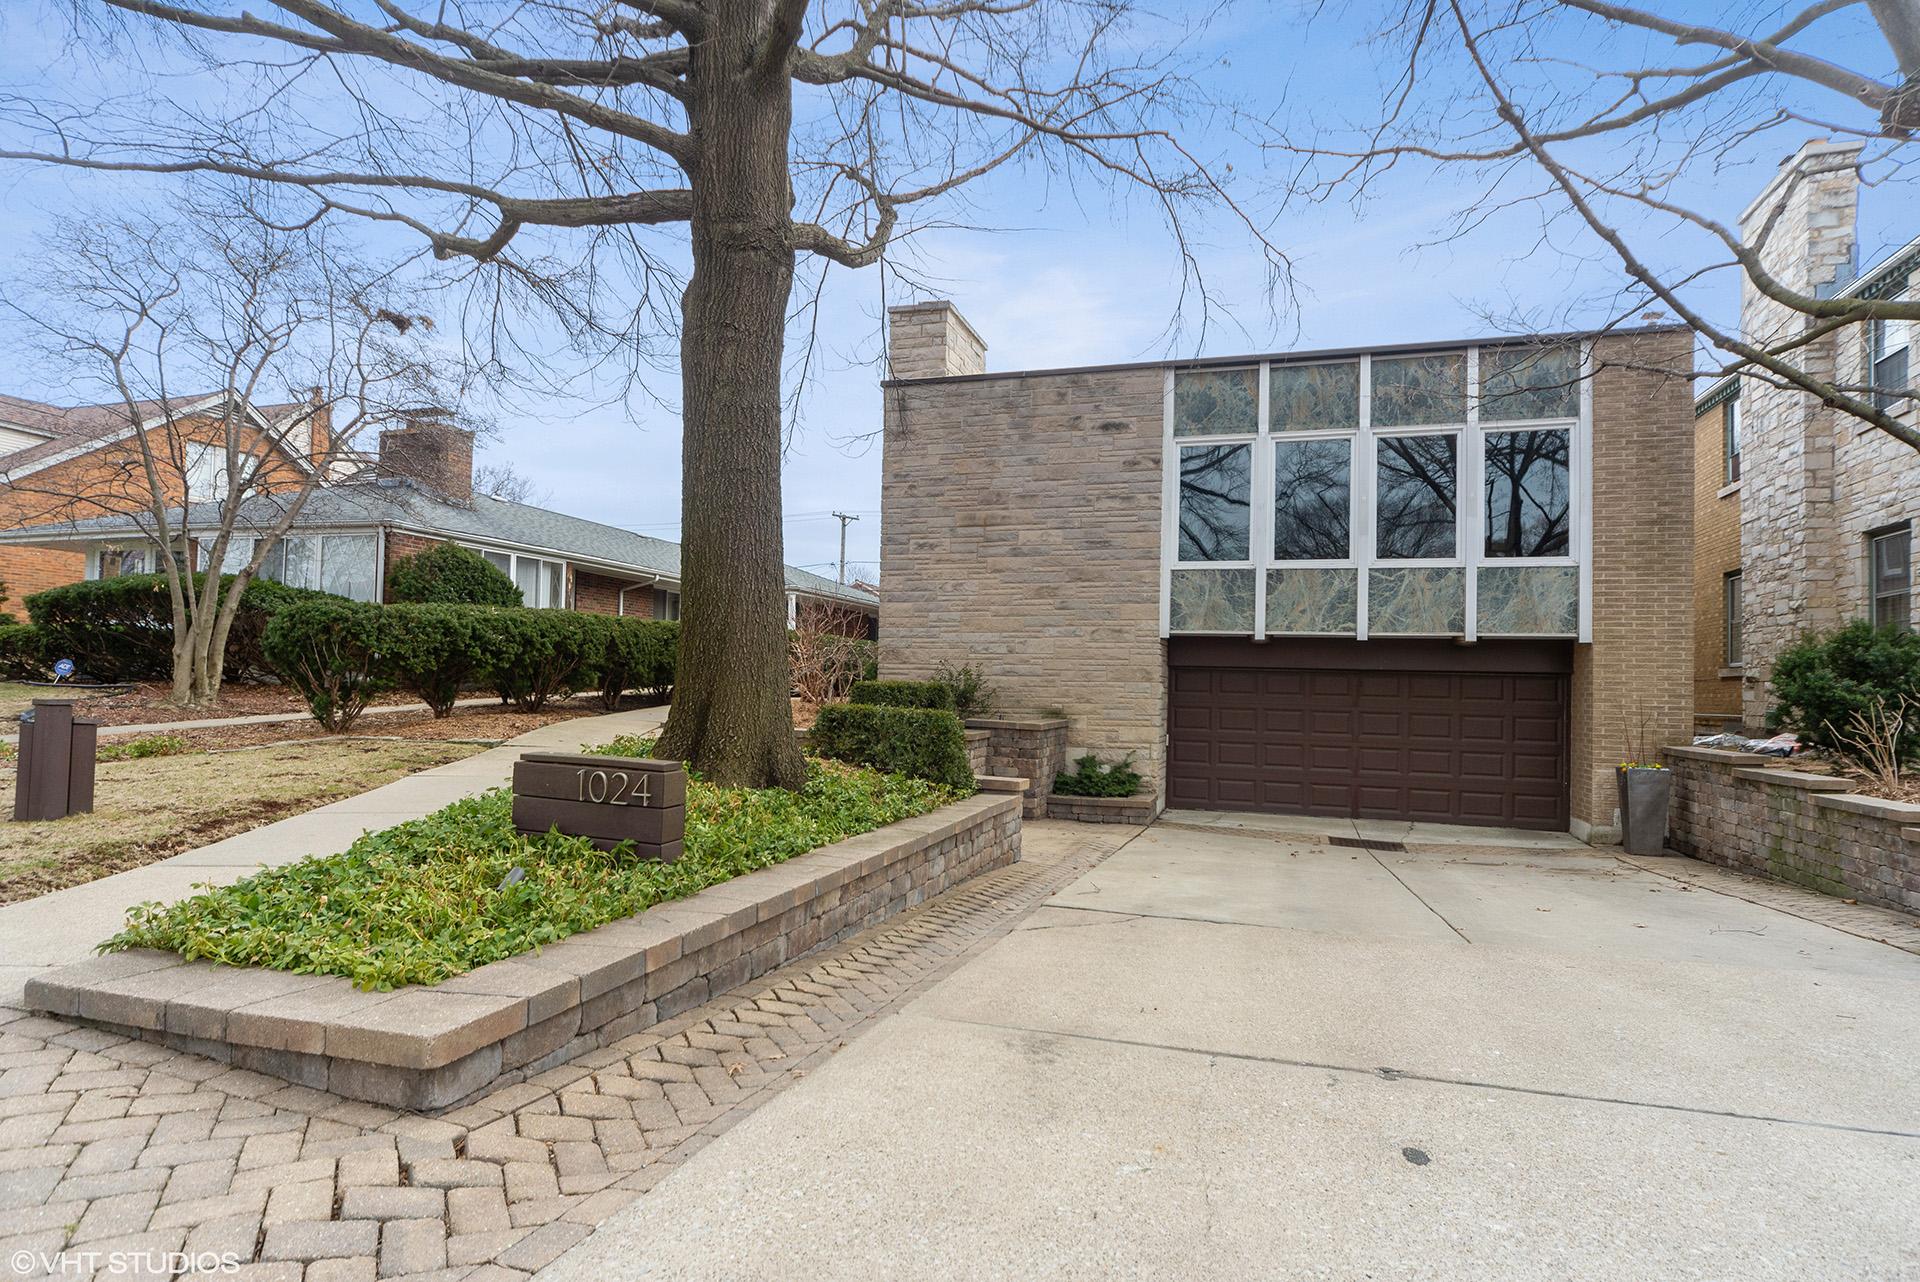 Economos Residence by John M. Considine in Oak Park